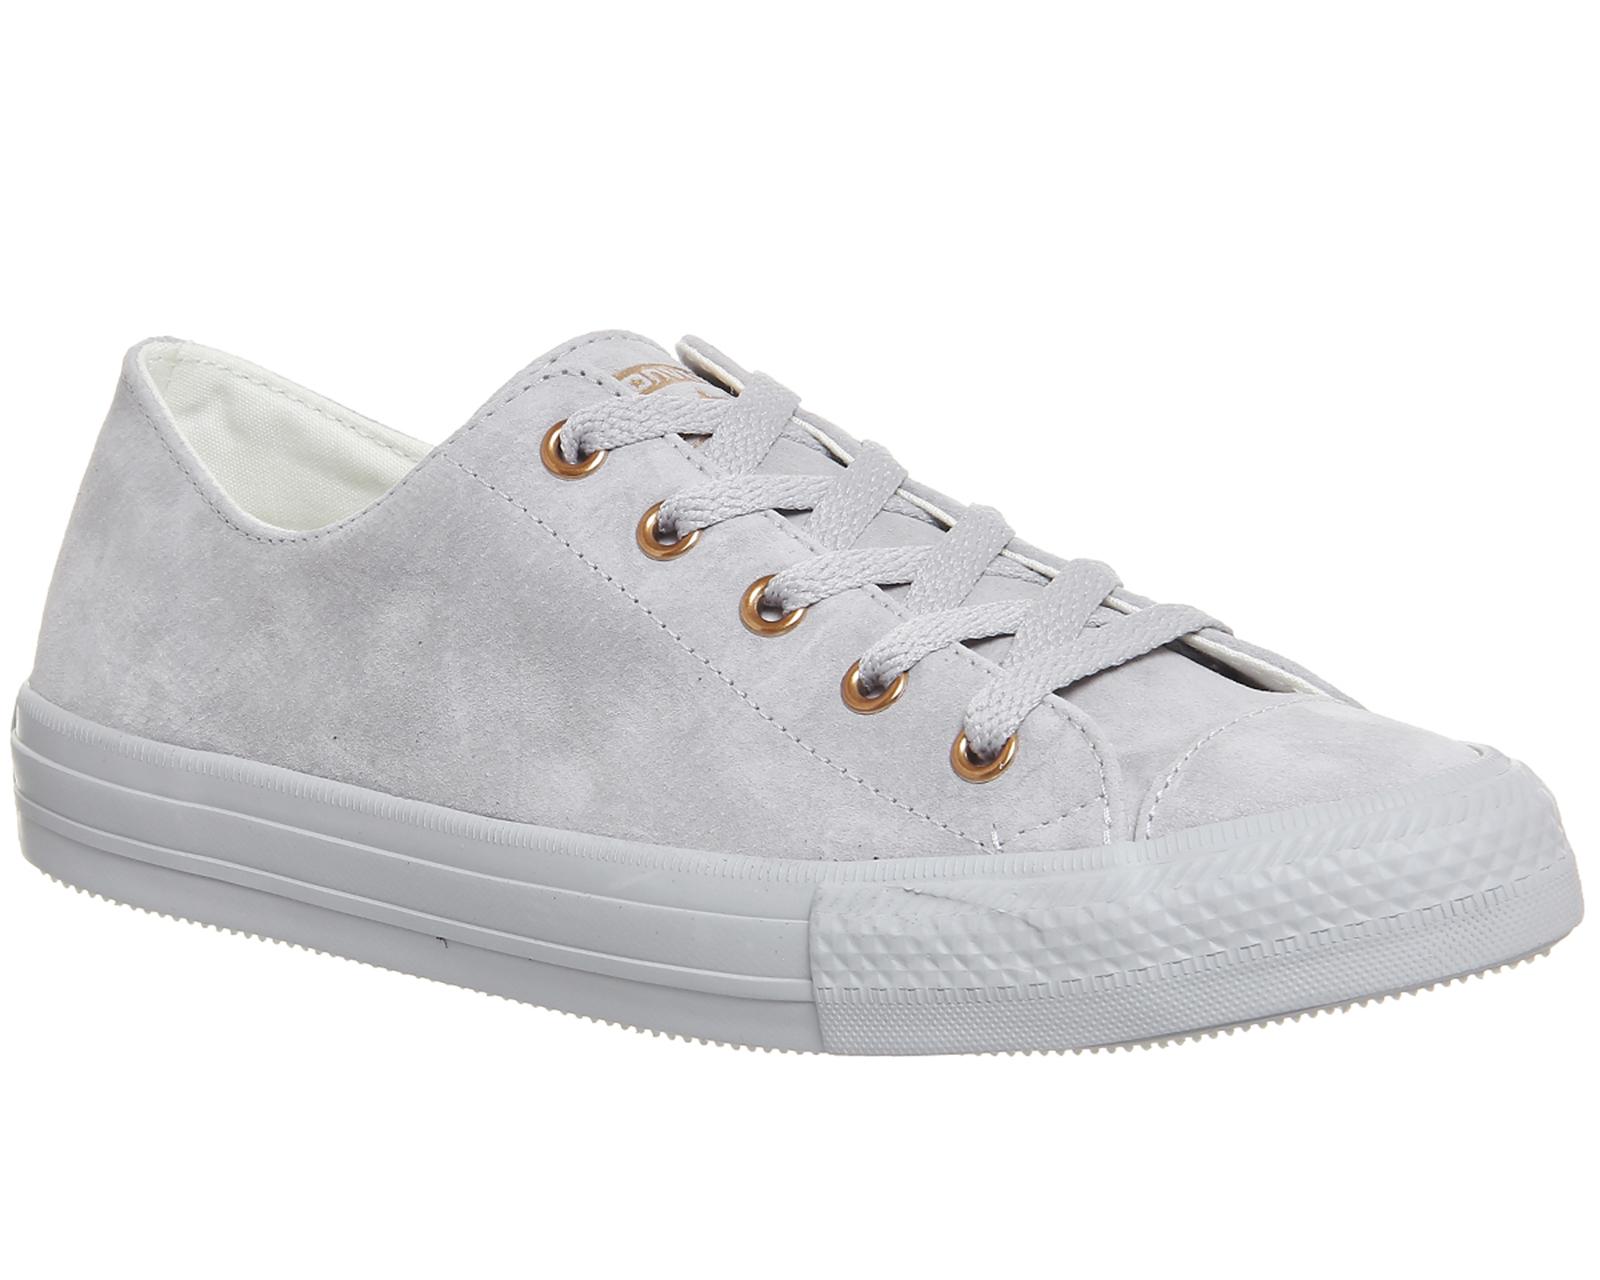 c752893788fc55 Sentinel Unisex Converse Ctas Gemma Low Grau ASH Grau ROSE GOLD EXCLUSIVE  Sneaker